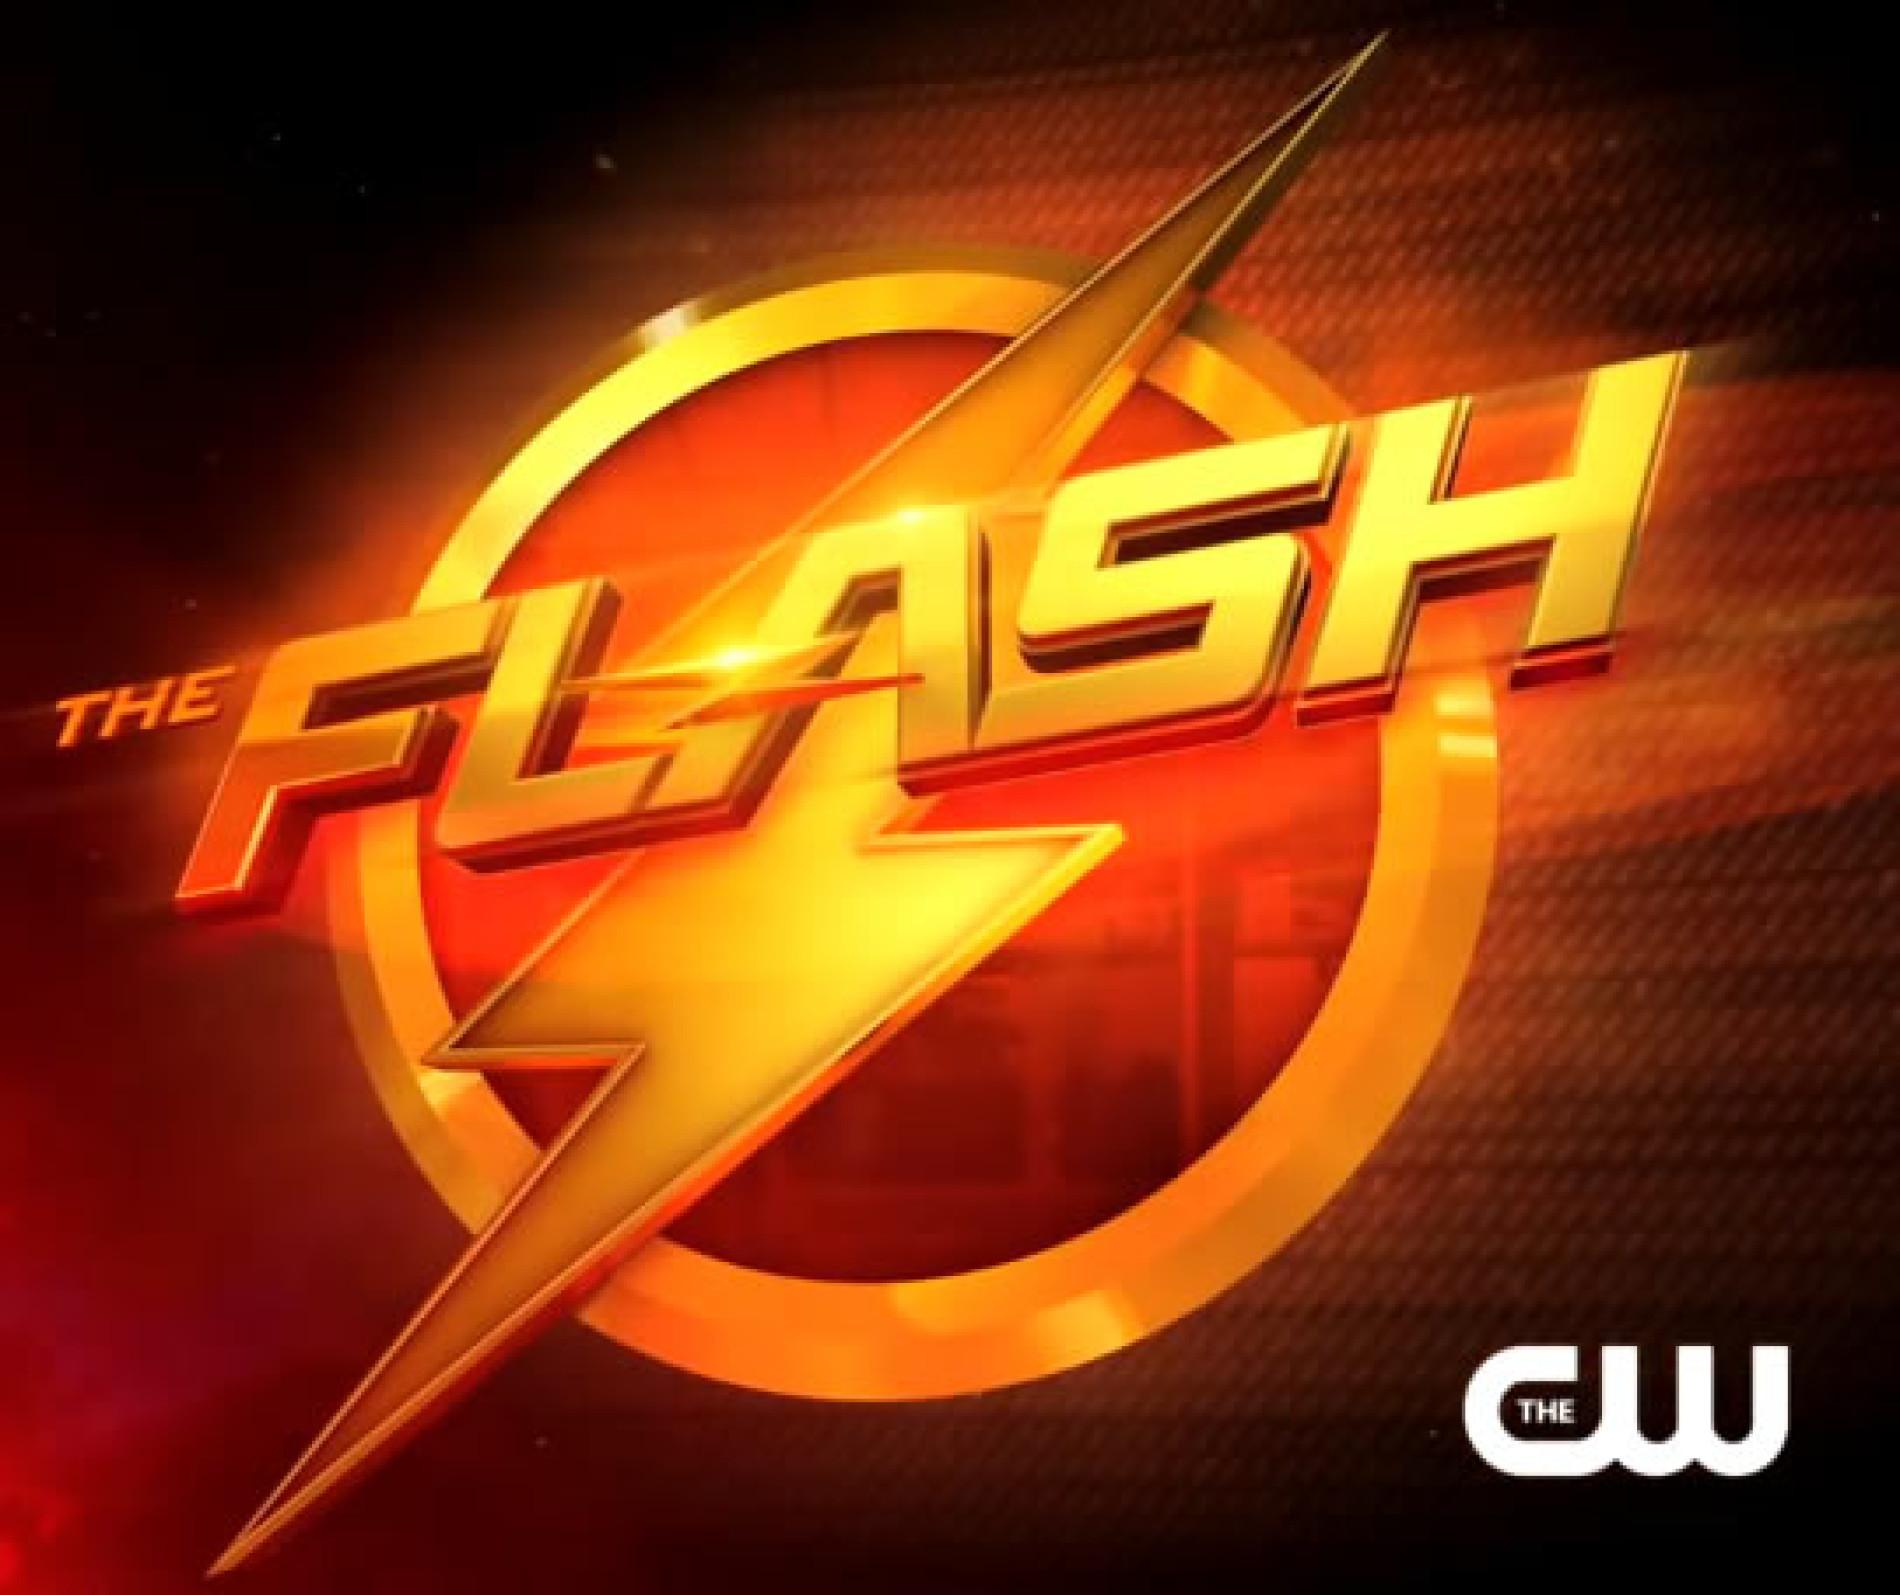 The Flash Série DC Comics da CW